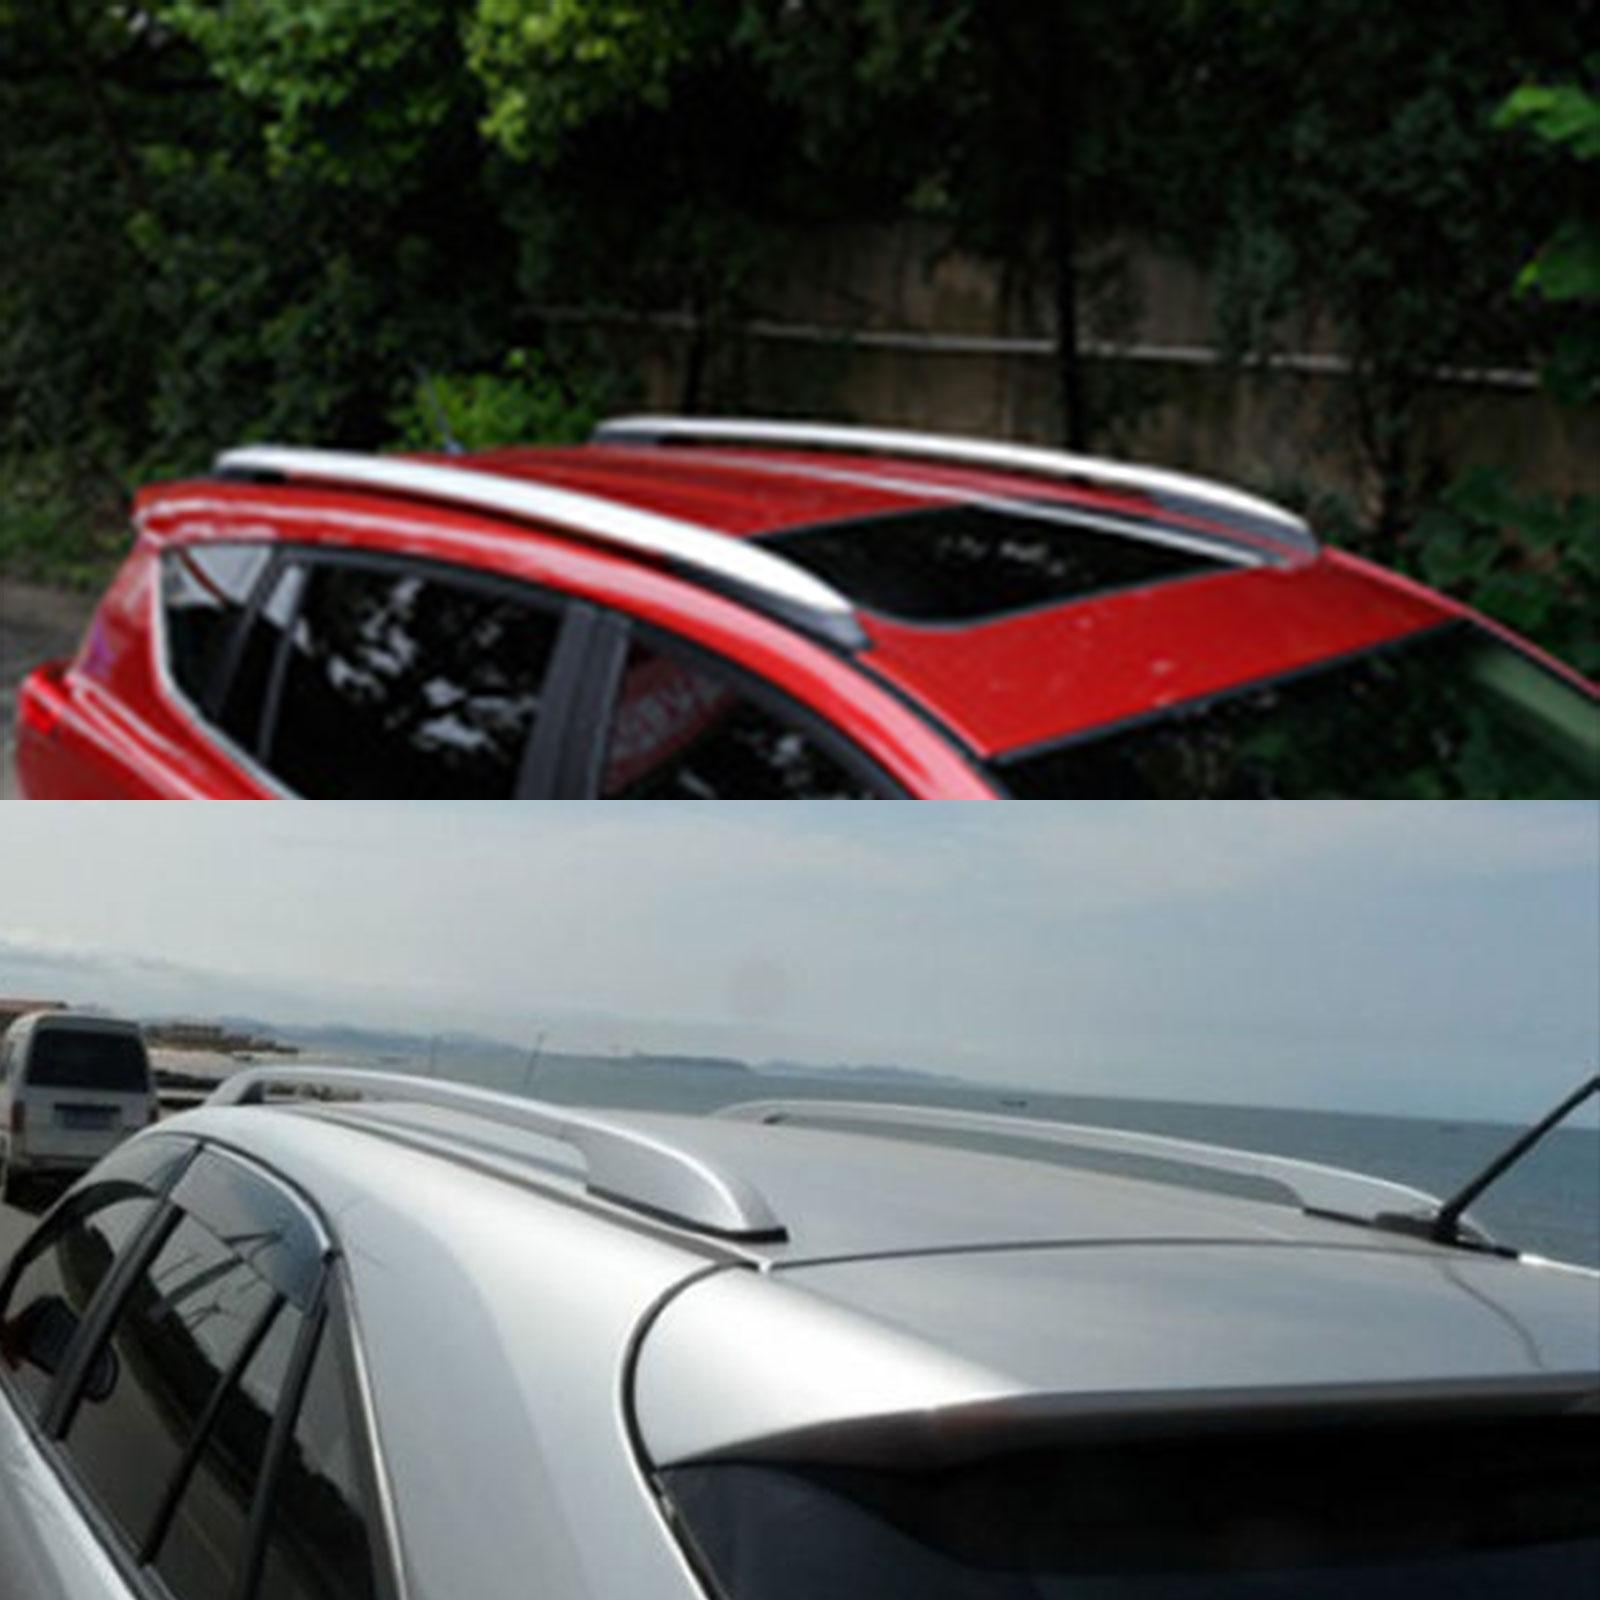 Roof Rack Cross Bars Carrier For Toyota Highlander Xle